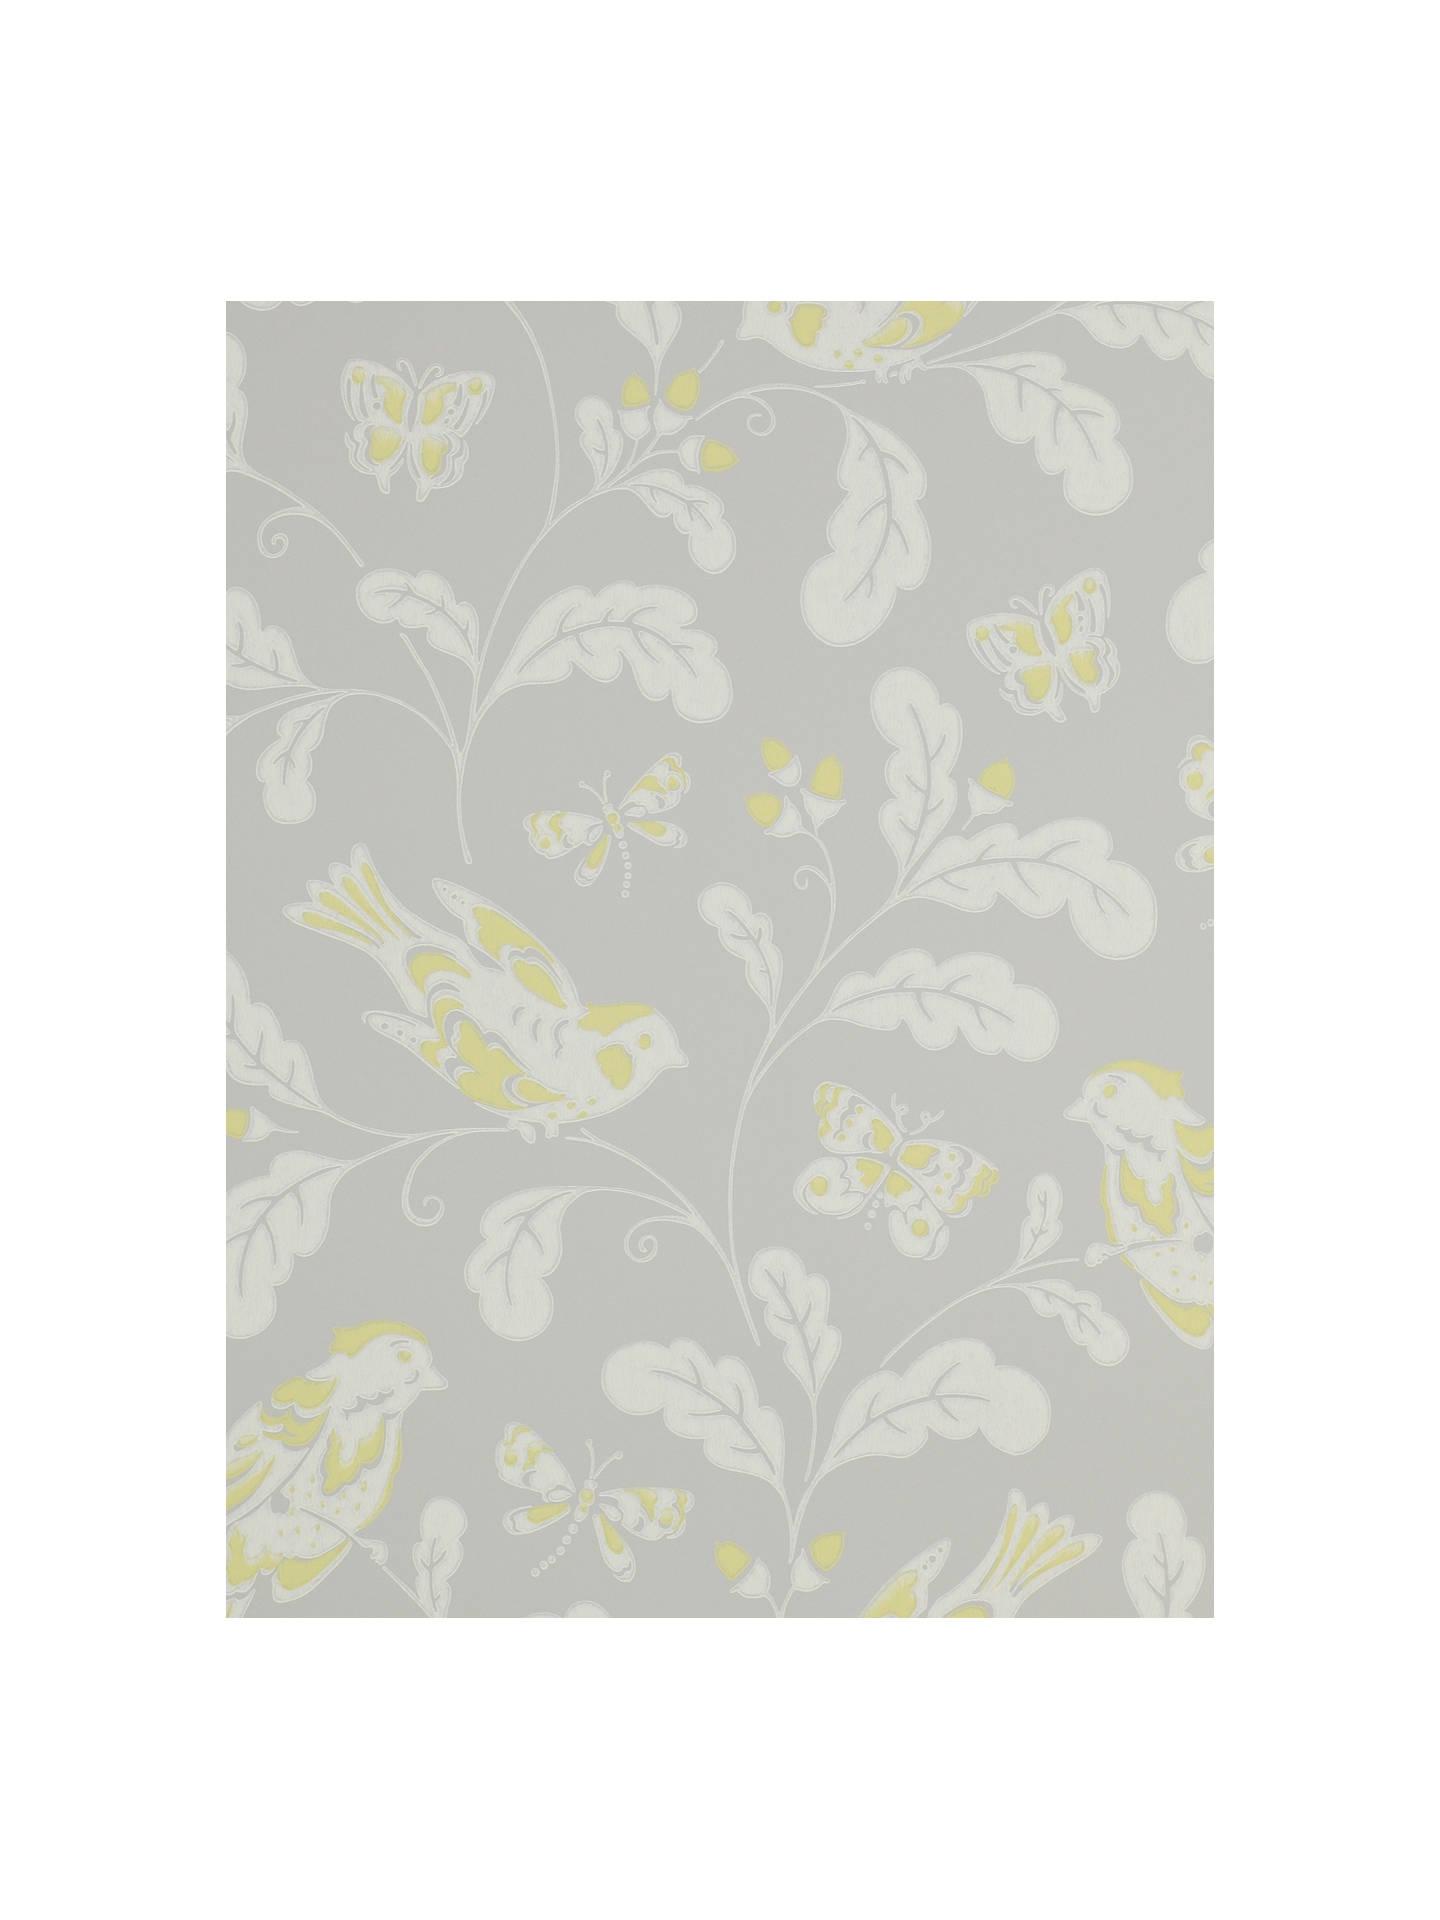 BuyJane Churchill Songbird Wallpaper Yellow Grey J139W 05 Online At Johnlewis